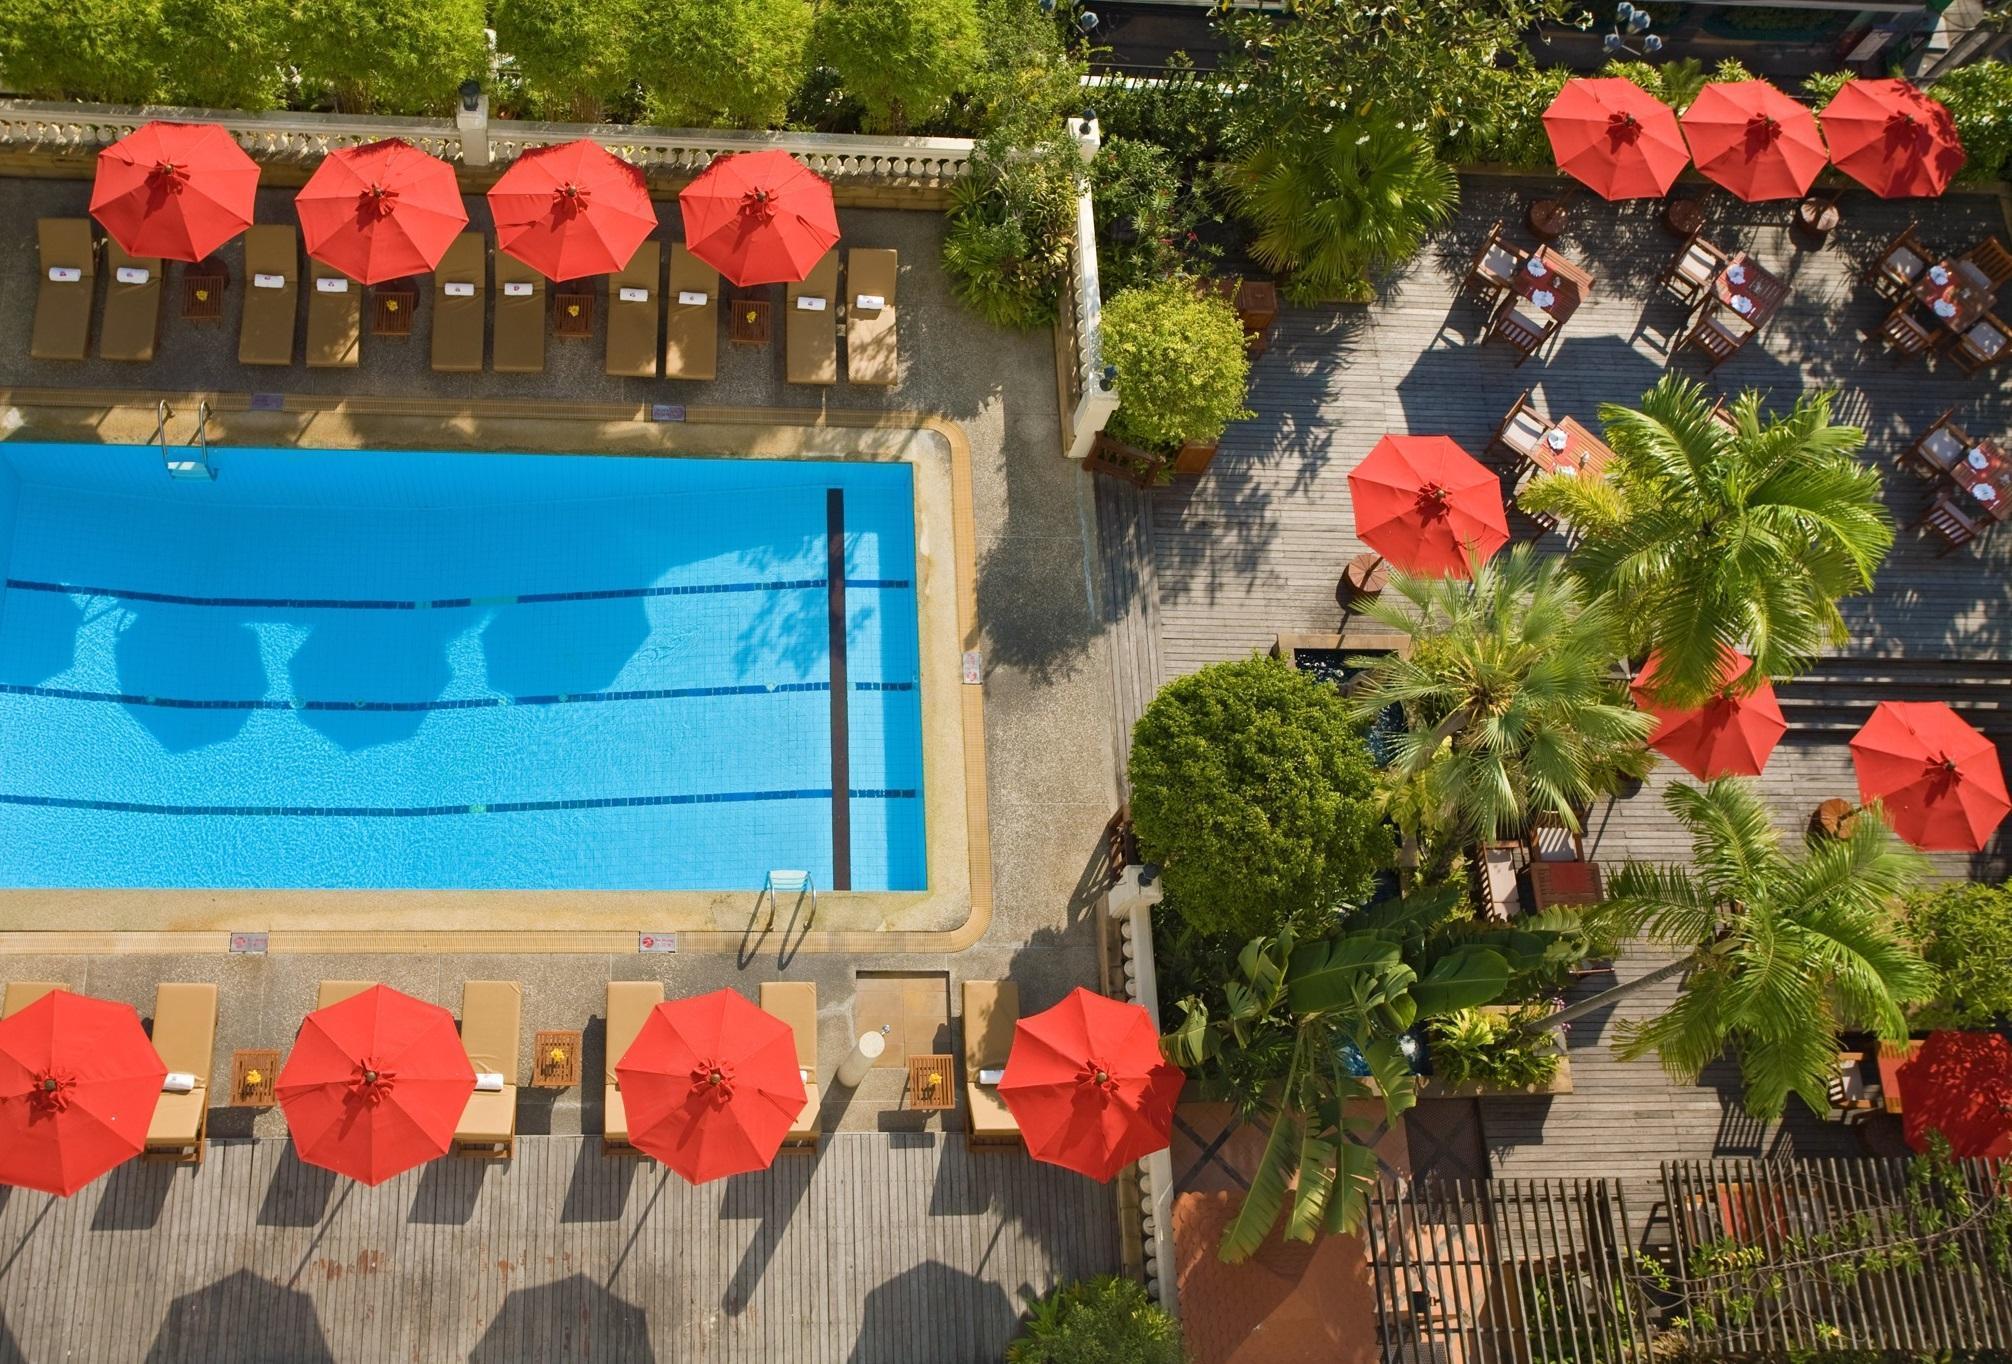 Boulevard Hotel Bangkok Sukhumvit โรงแรมบูเลอวาร์ด กรุงเทพฯ สุขุมวิท